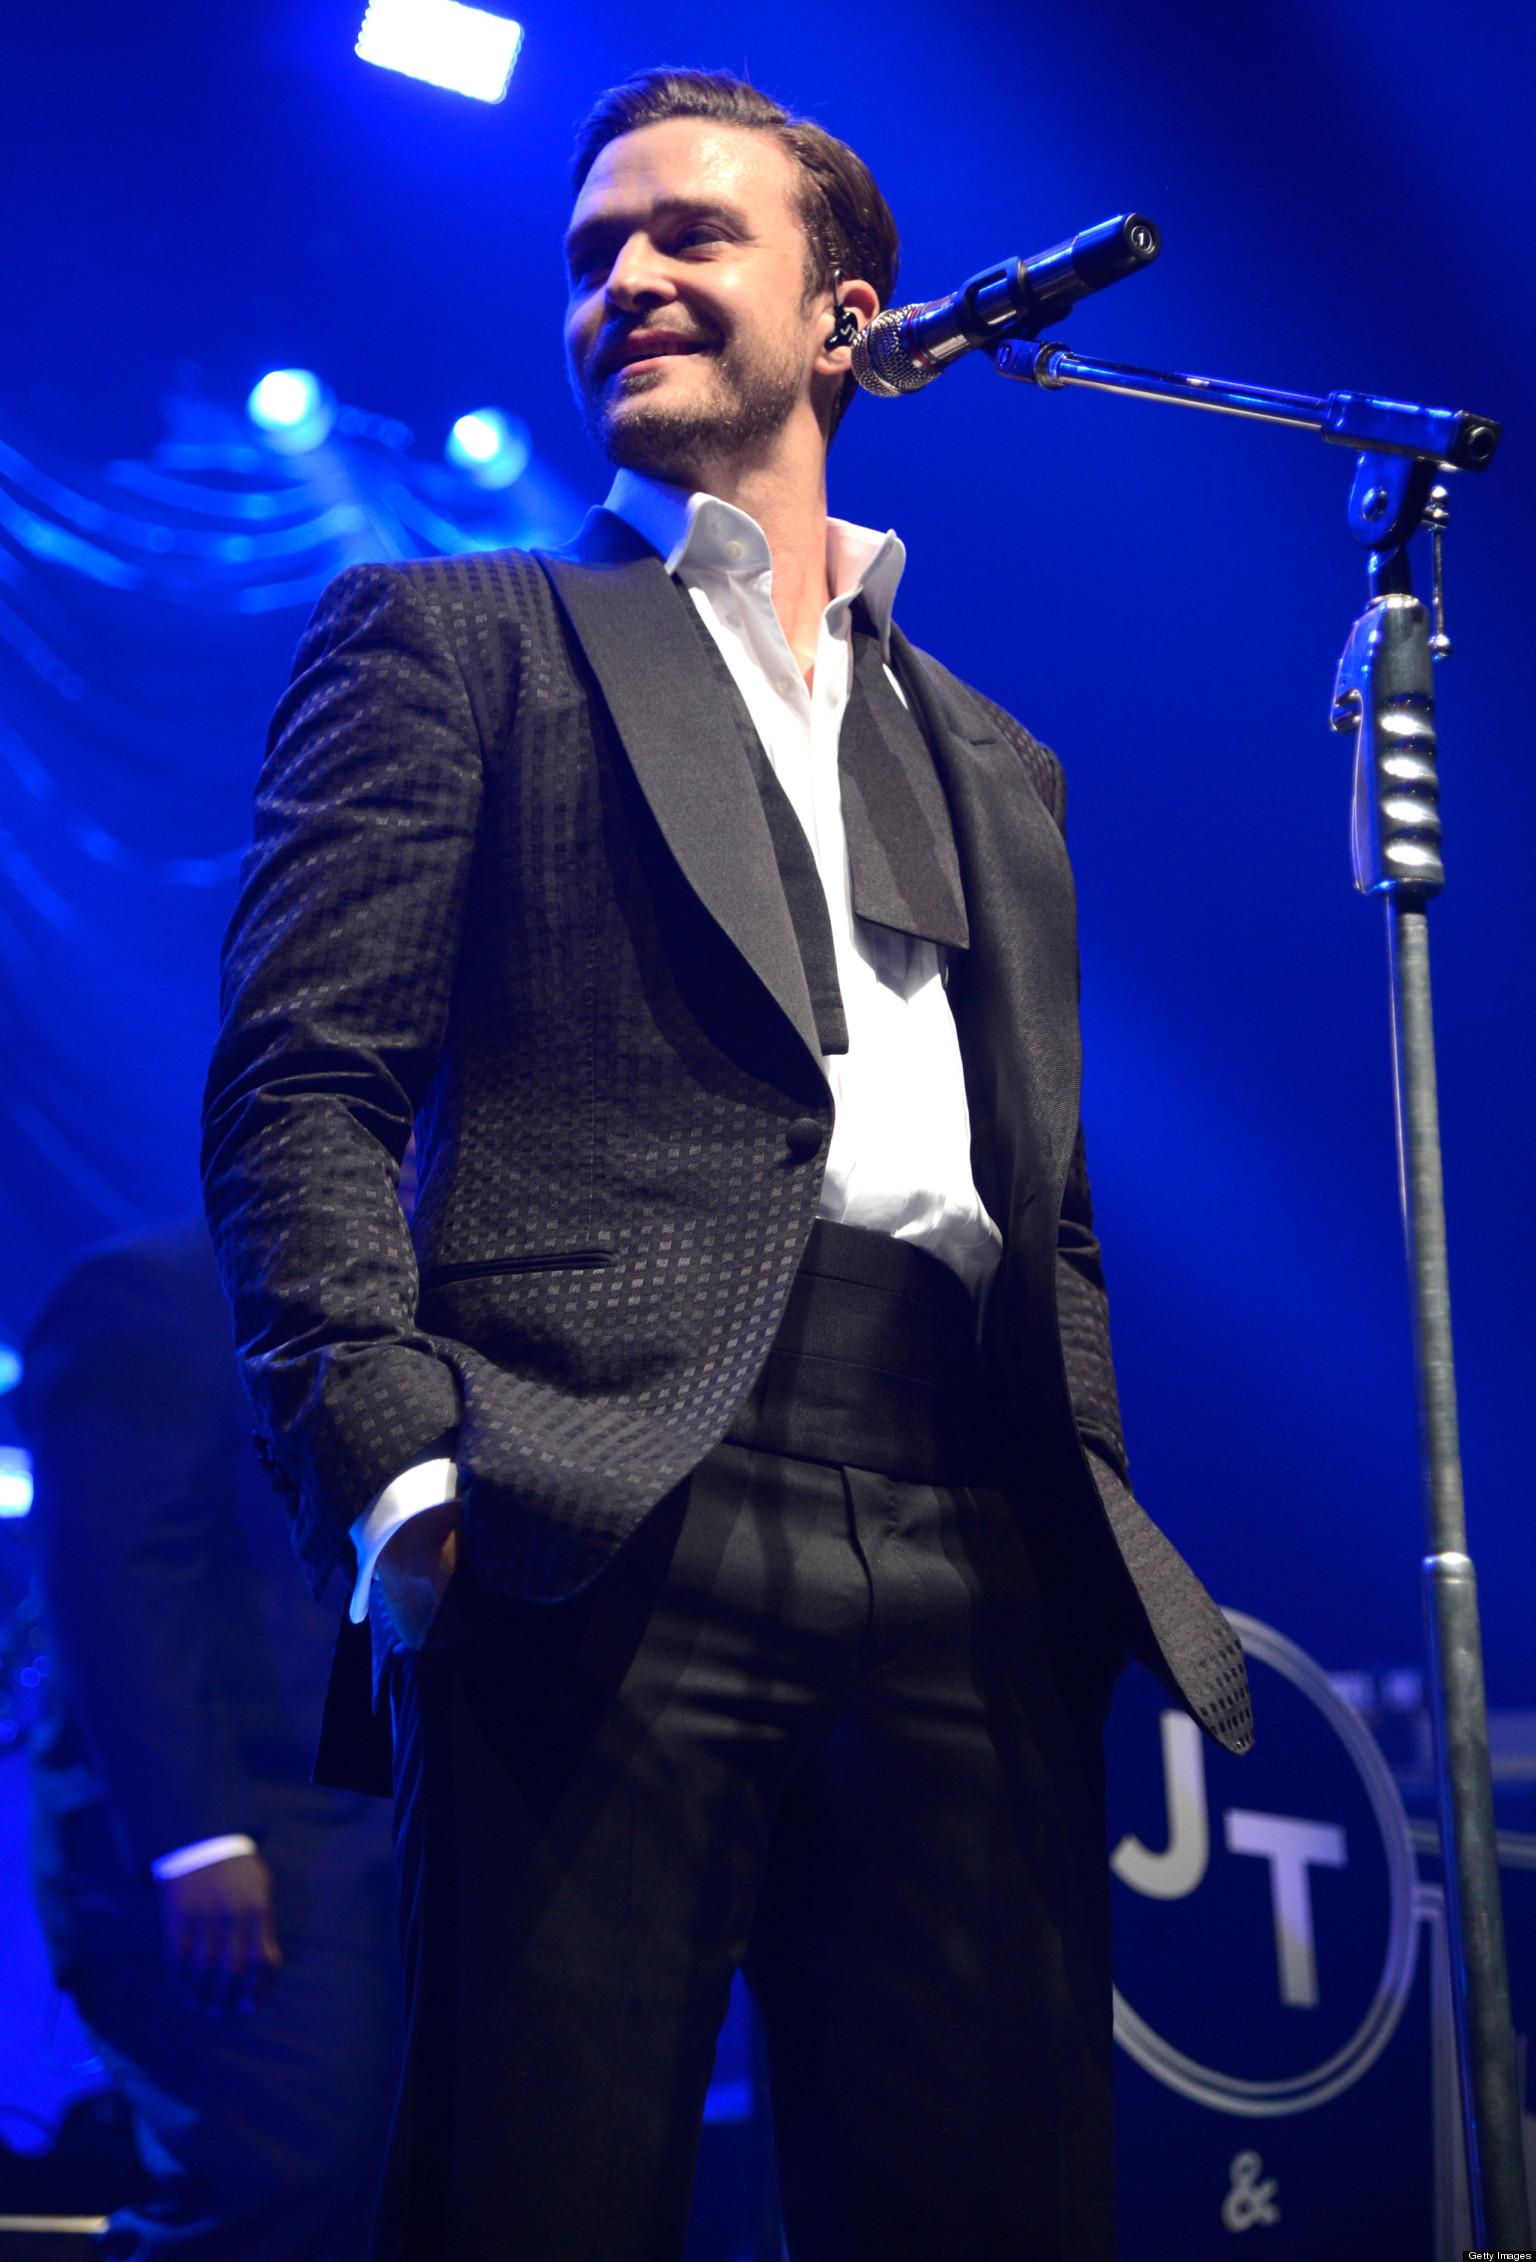 Justin Timberlake The 20/20 Experience Part 2 Торрент